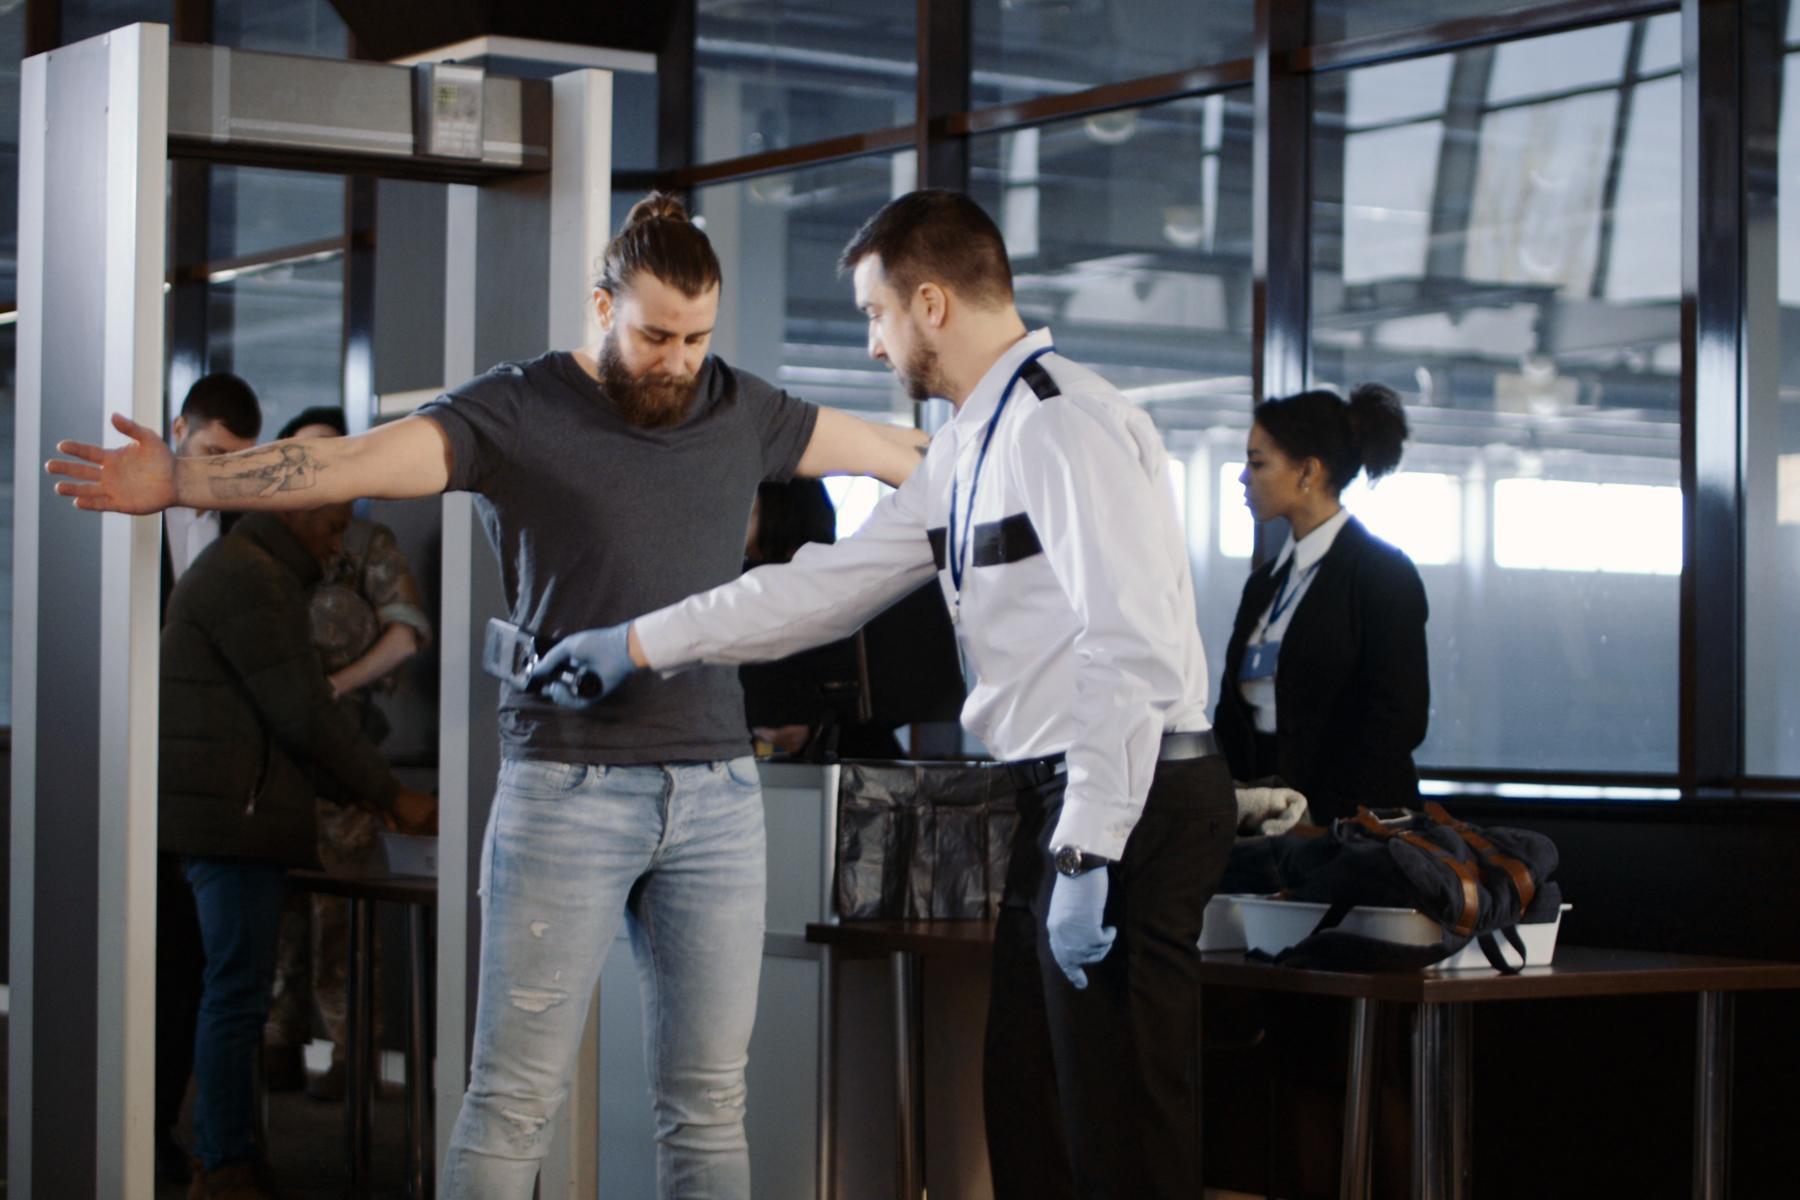 I Got Flagged by TSA: Now What?